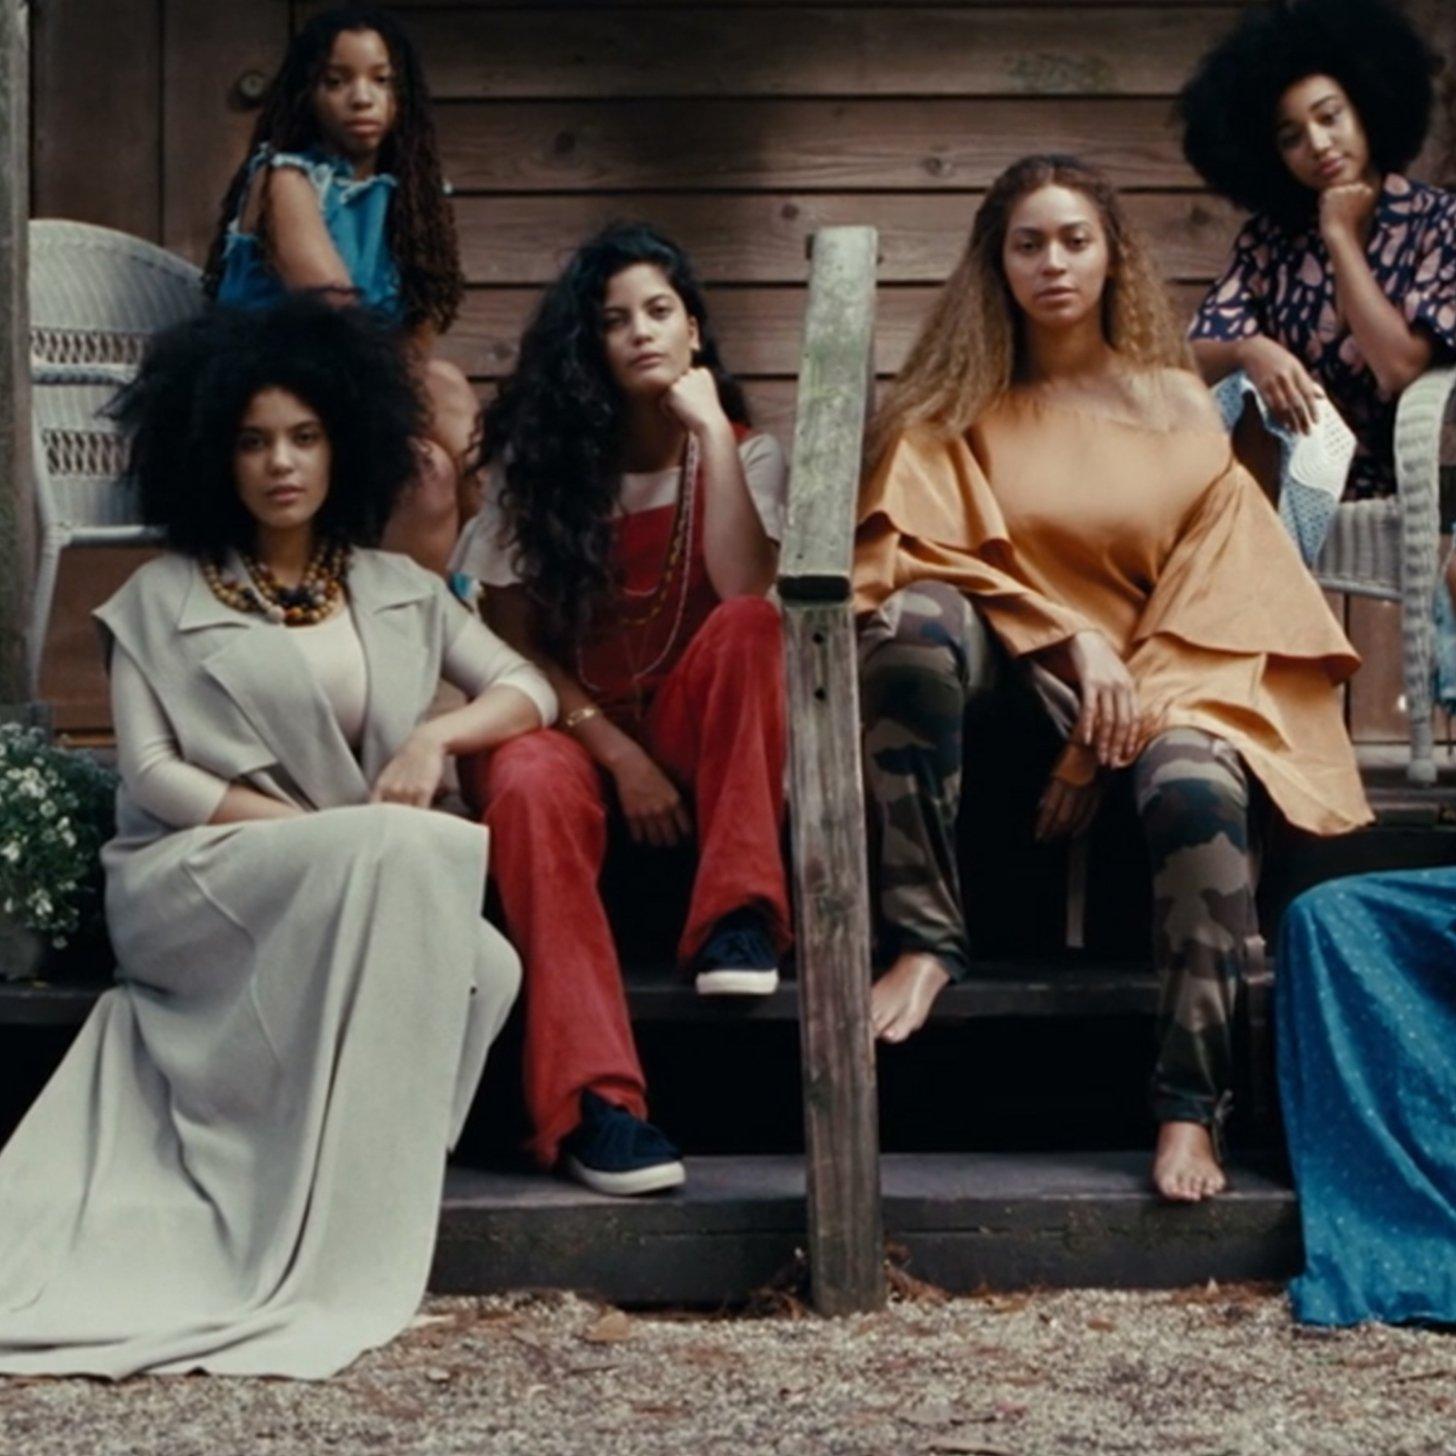 IBEYI Featured in Lemonade by Beyonce